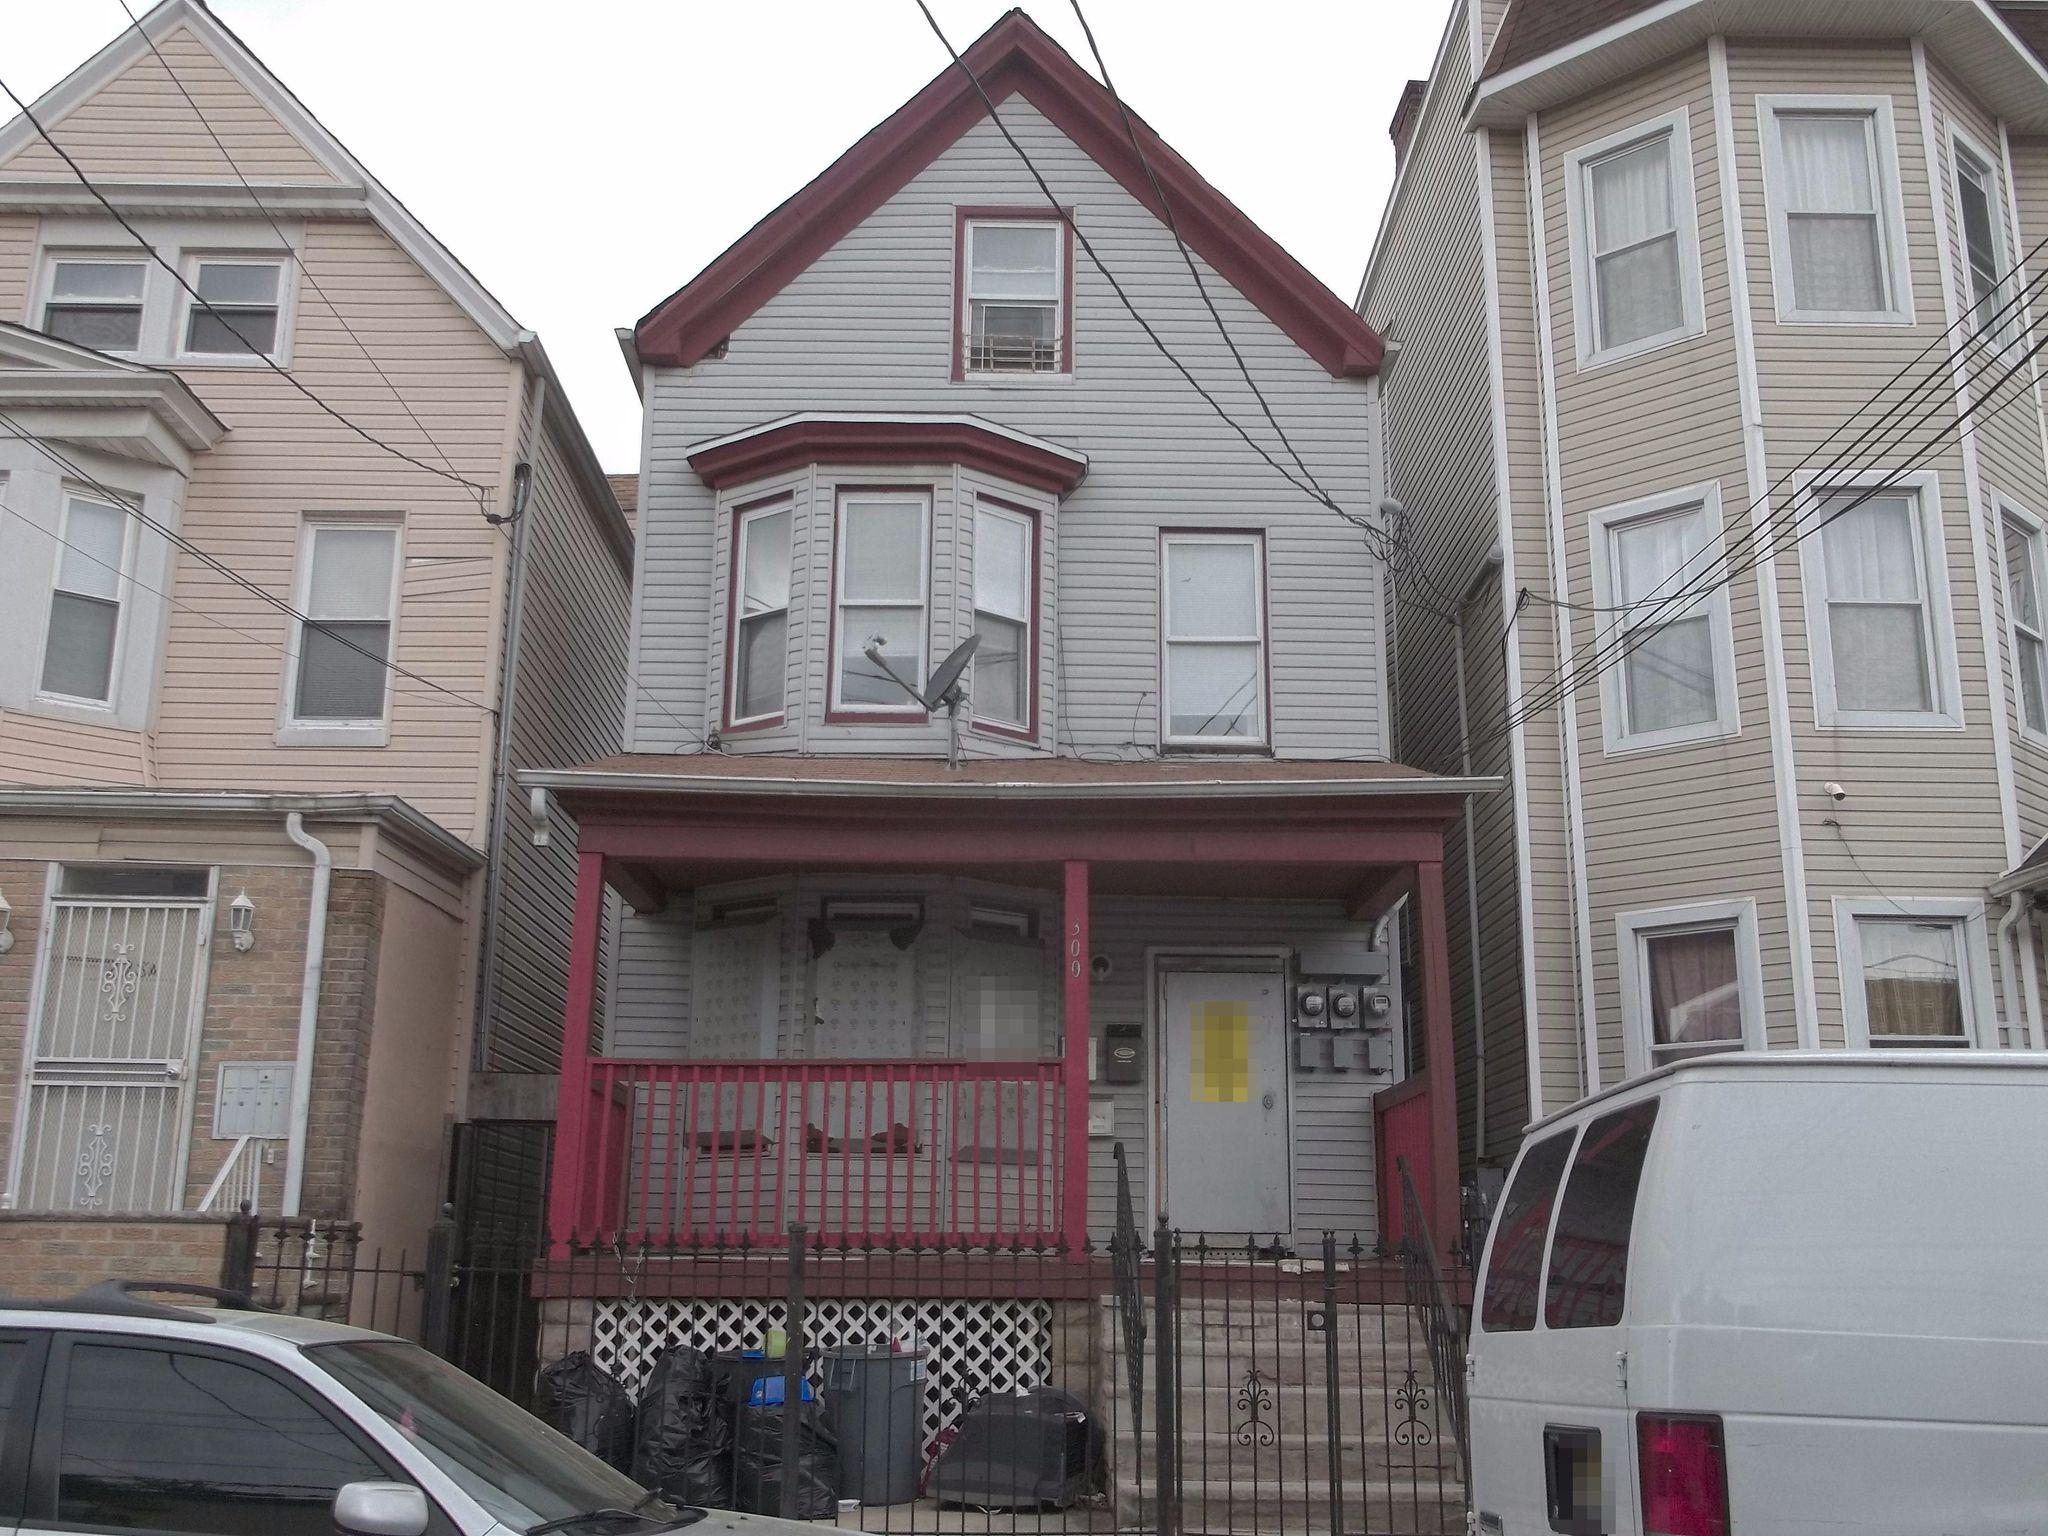 300 N 5th St Newark NJ Estimate and Home Details